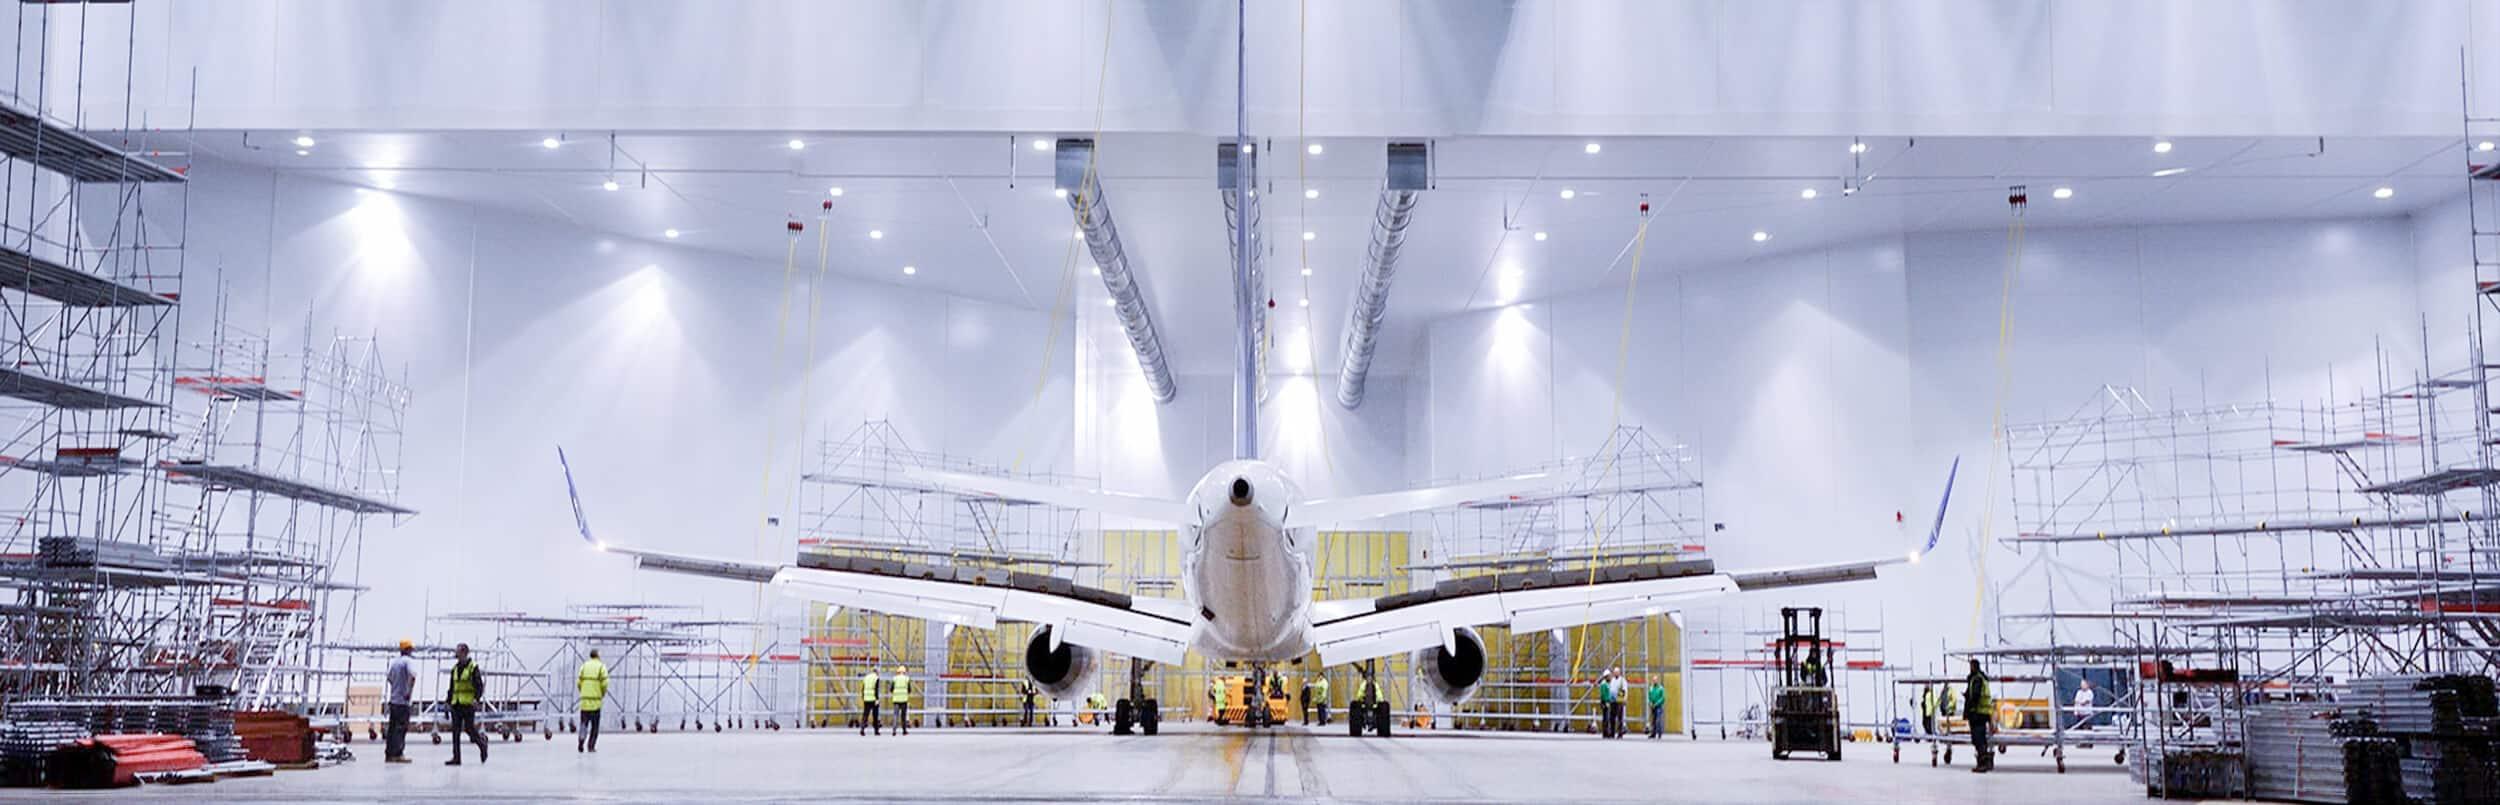 Airblast Spray Booths for Aerospace